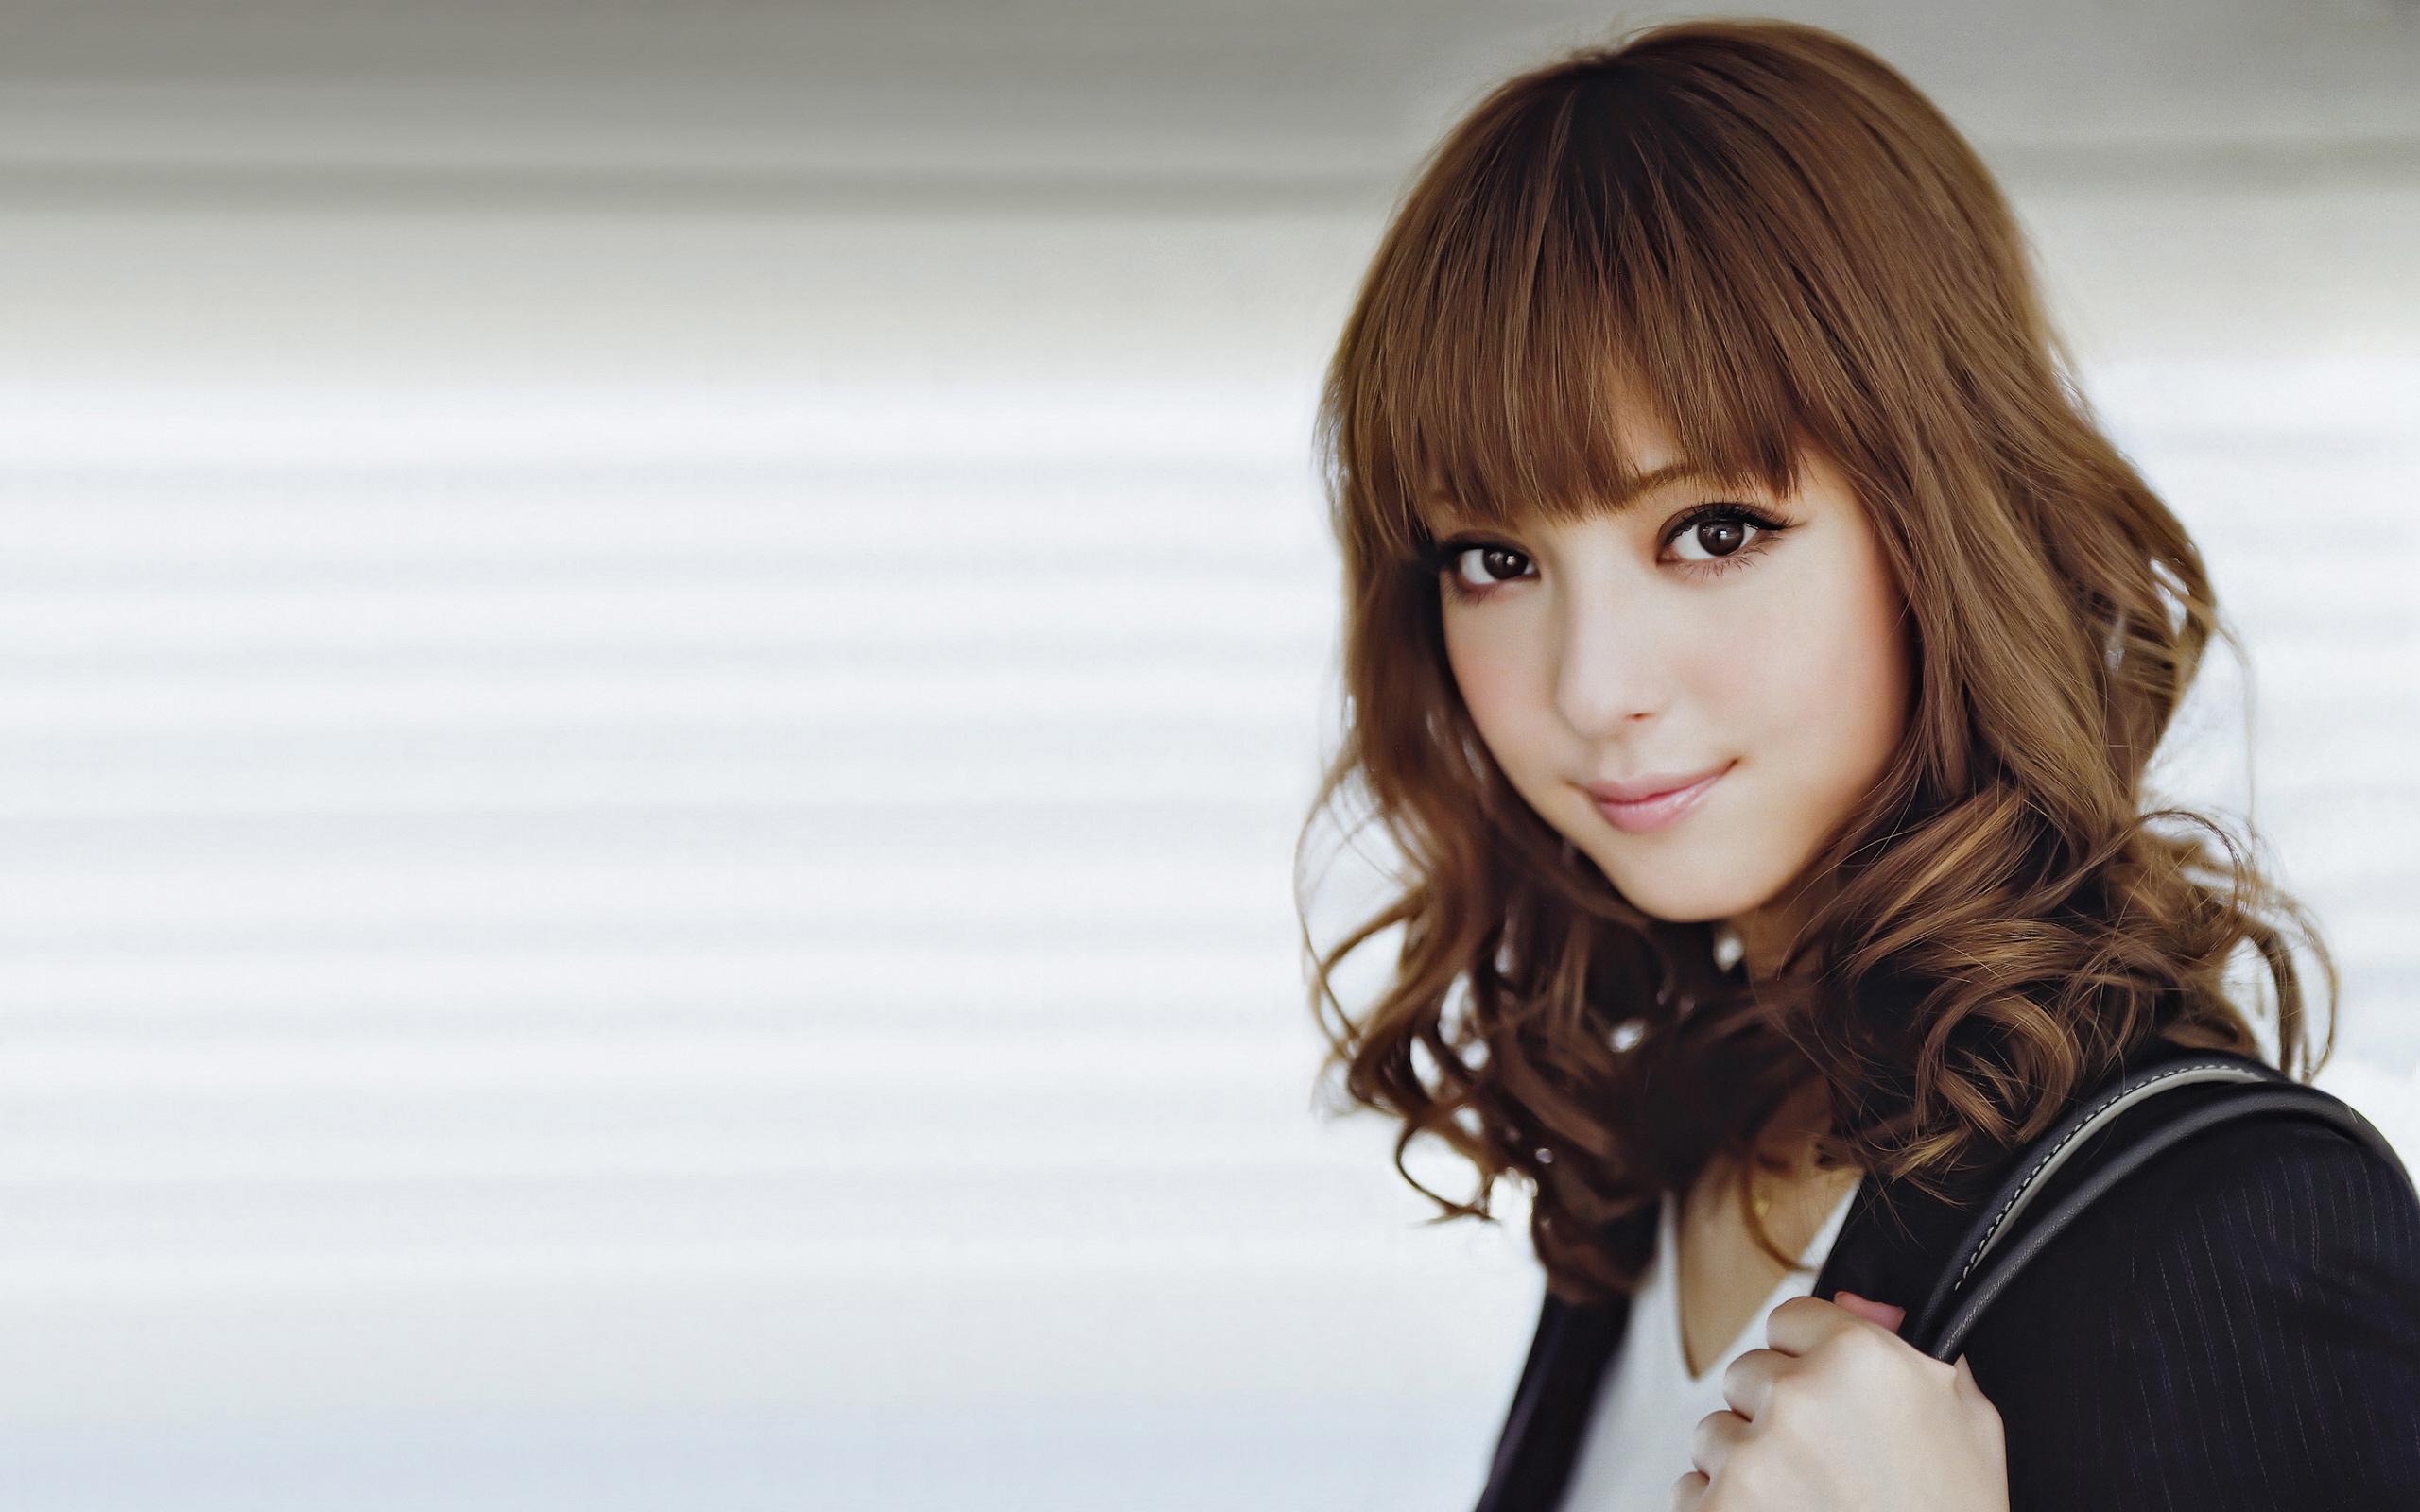 Nozomi Sasaki download free wallpapers